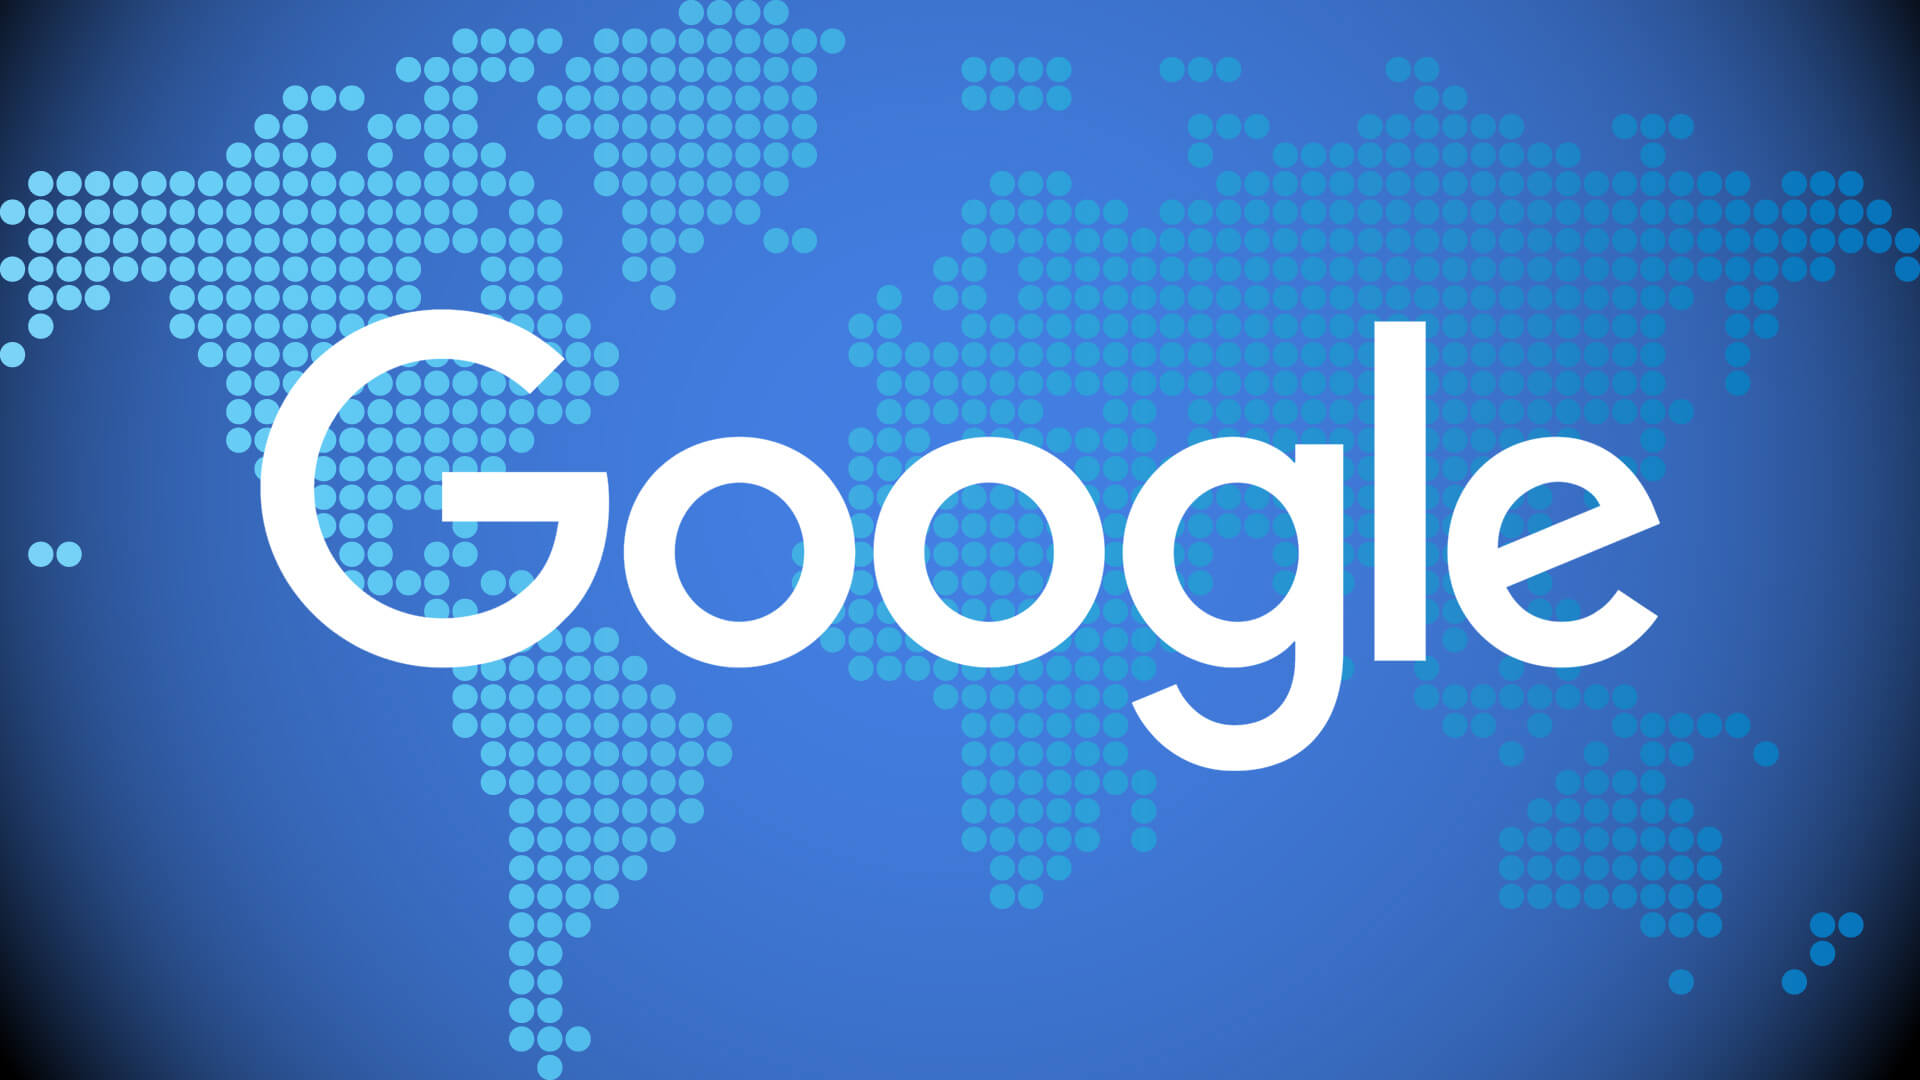 google-world-maps4-ss-1920